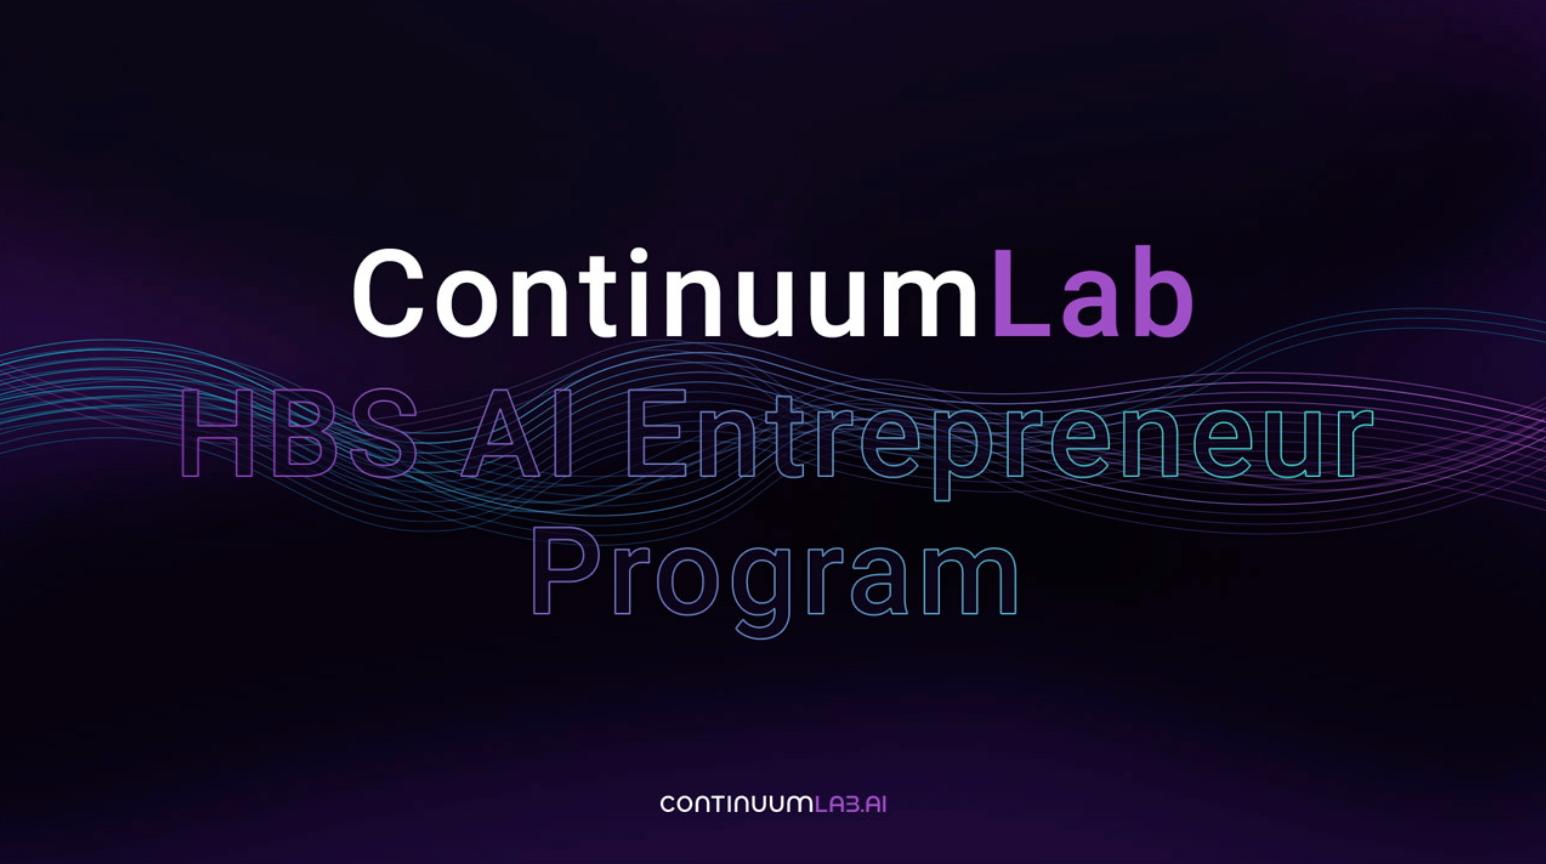 Video Academy Continuumlab - aurorachiara.com